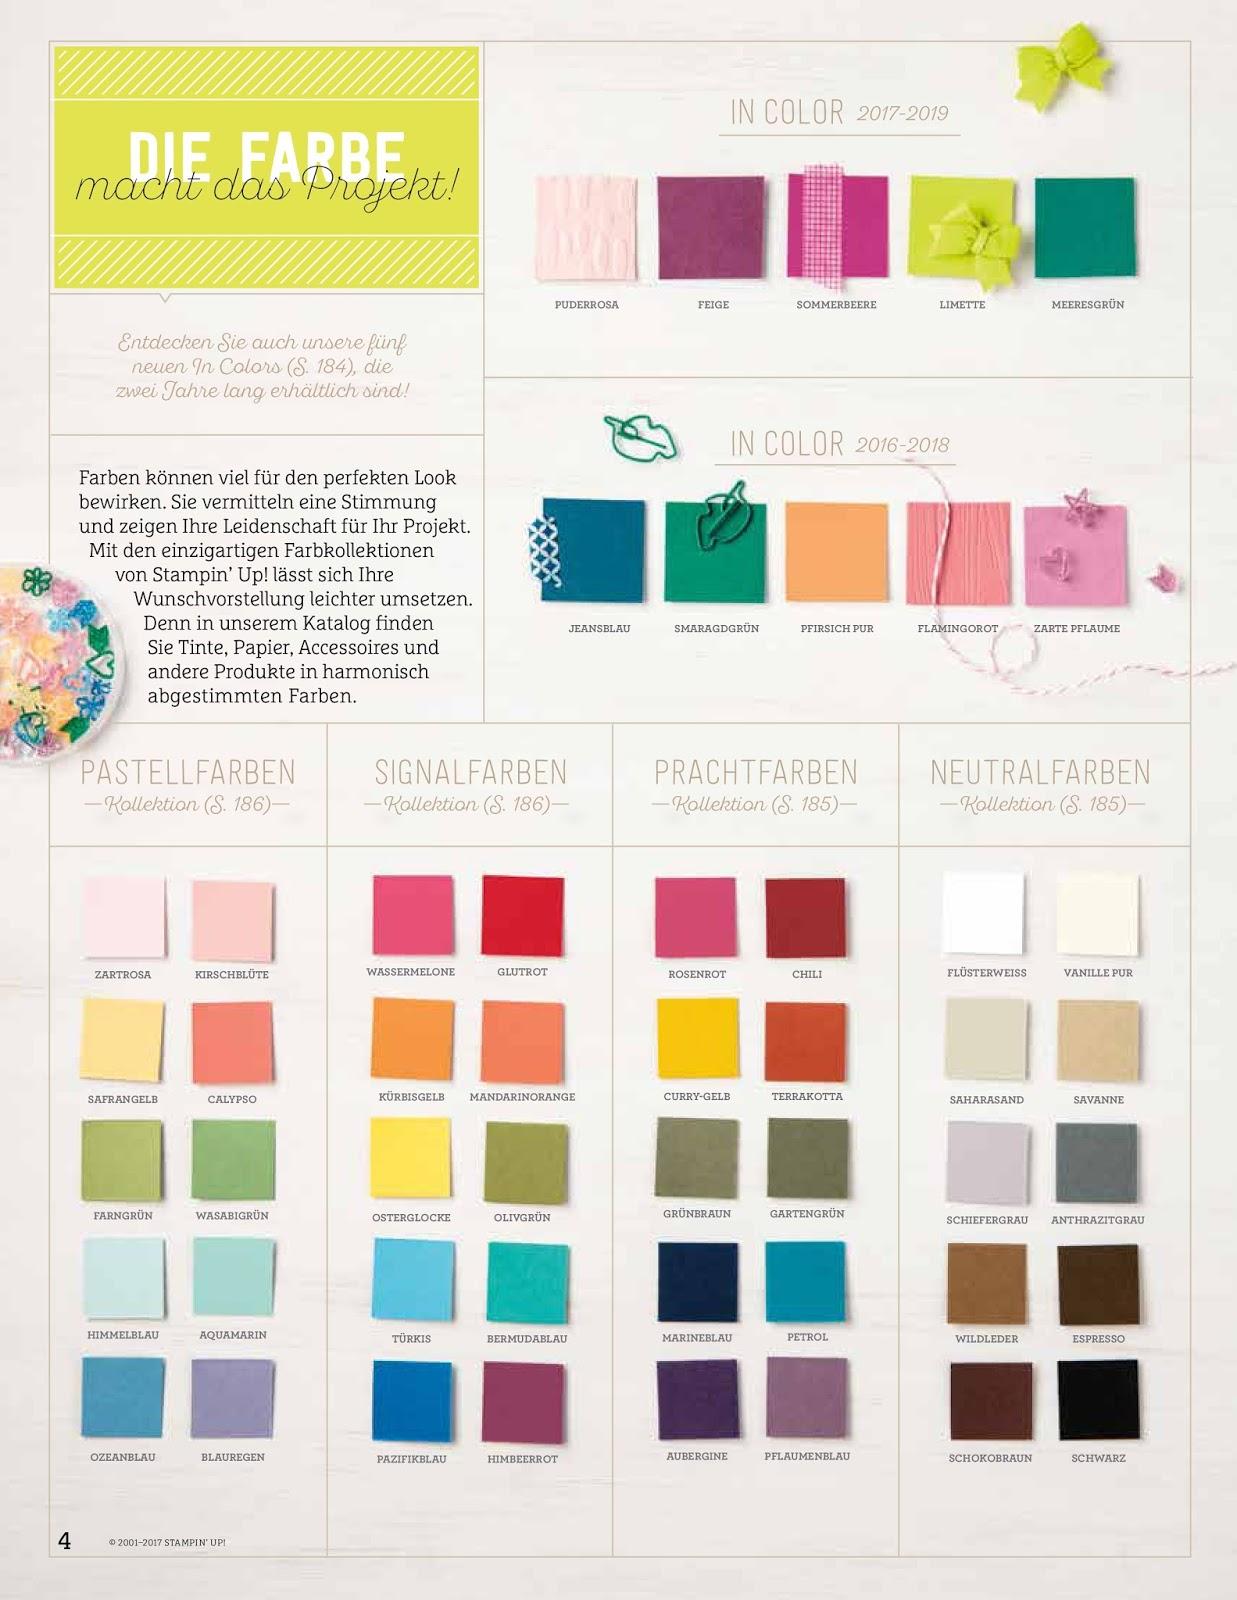 Farbfamilien